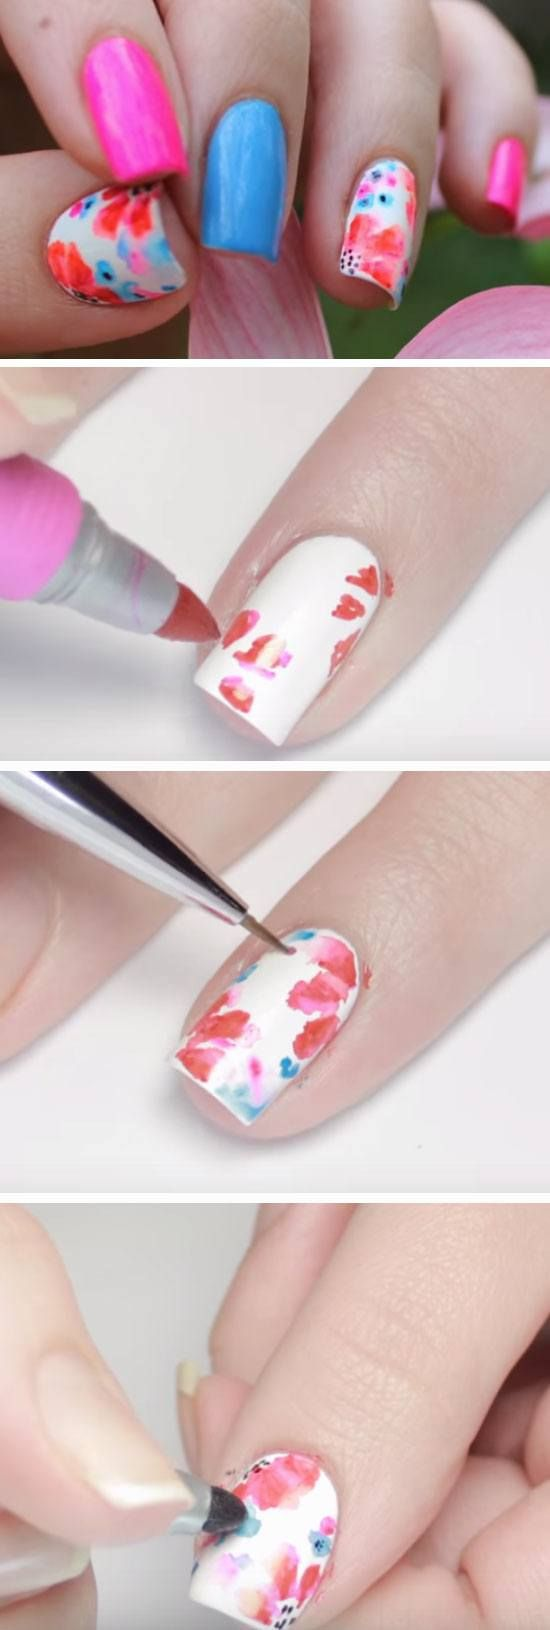 best 25+ teen nail art ideas on pinterest | teen nail designs